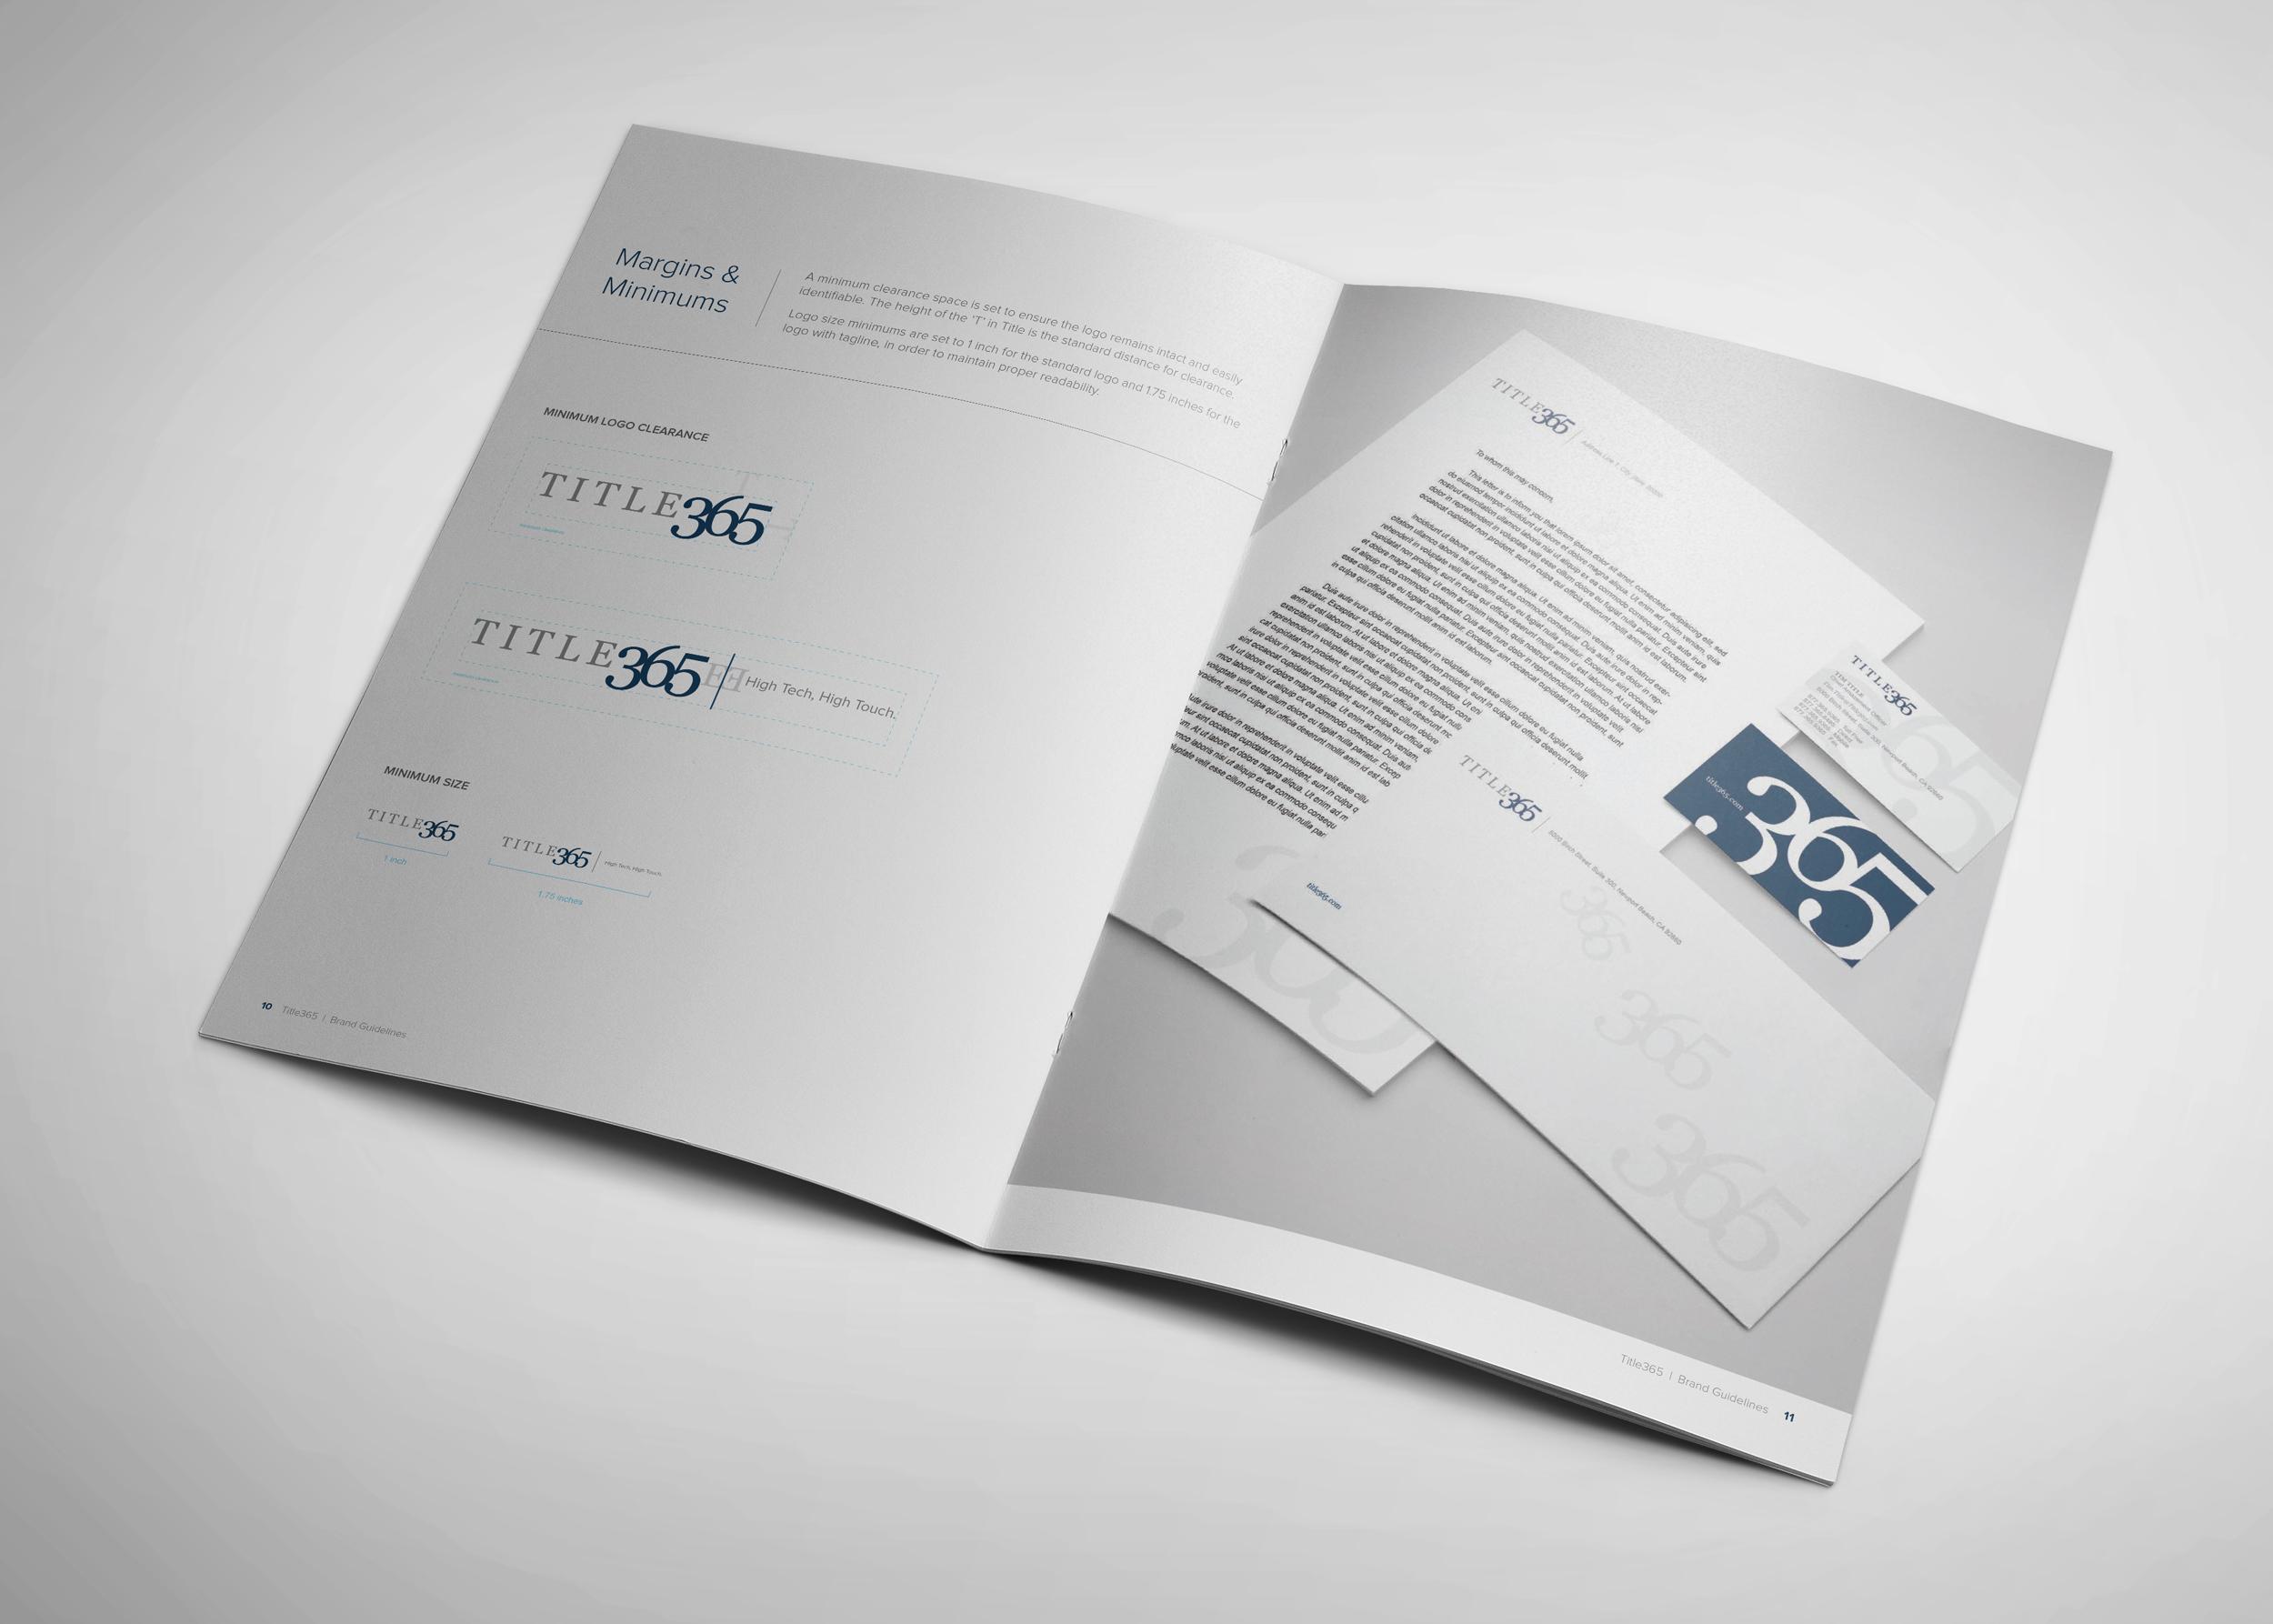 Brand_Title365_Inside_6.jpg